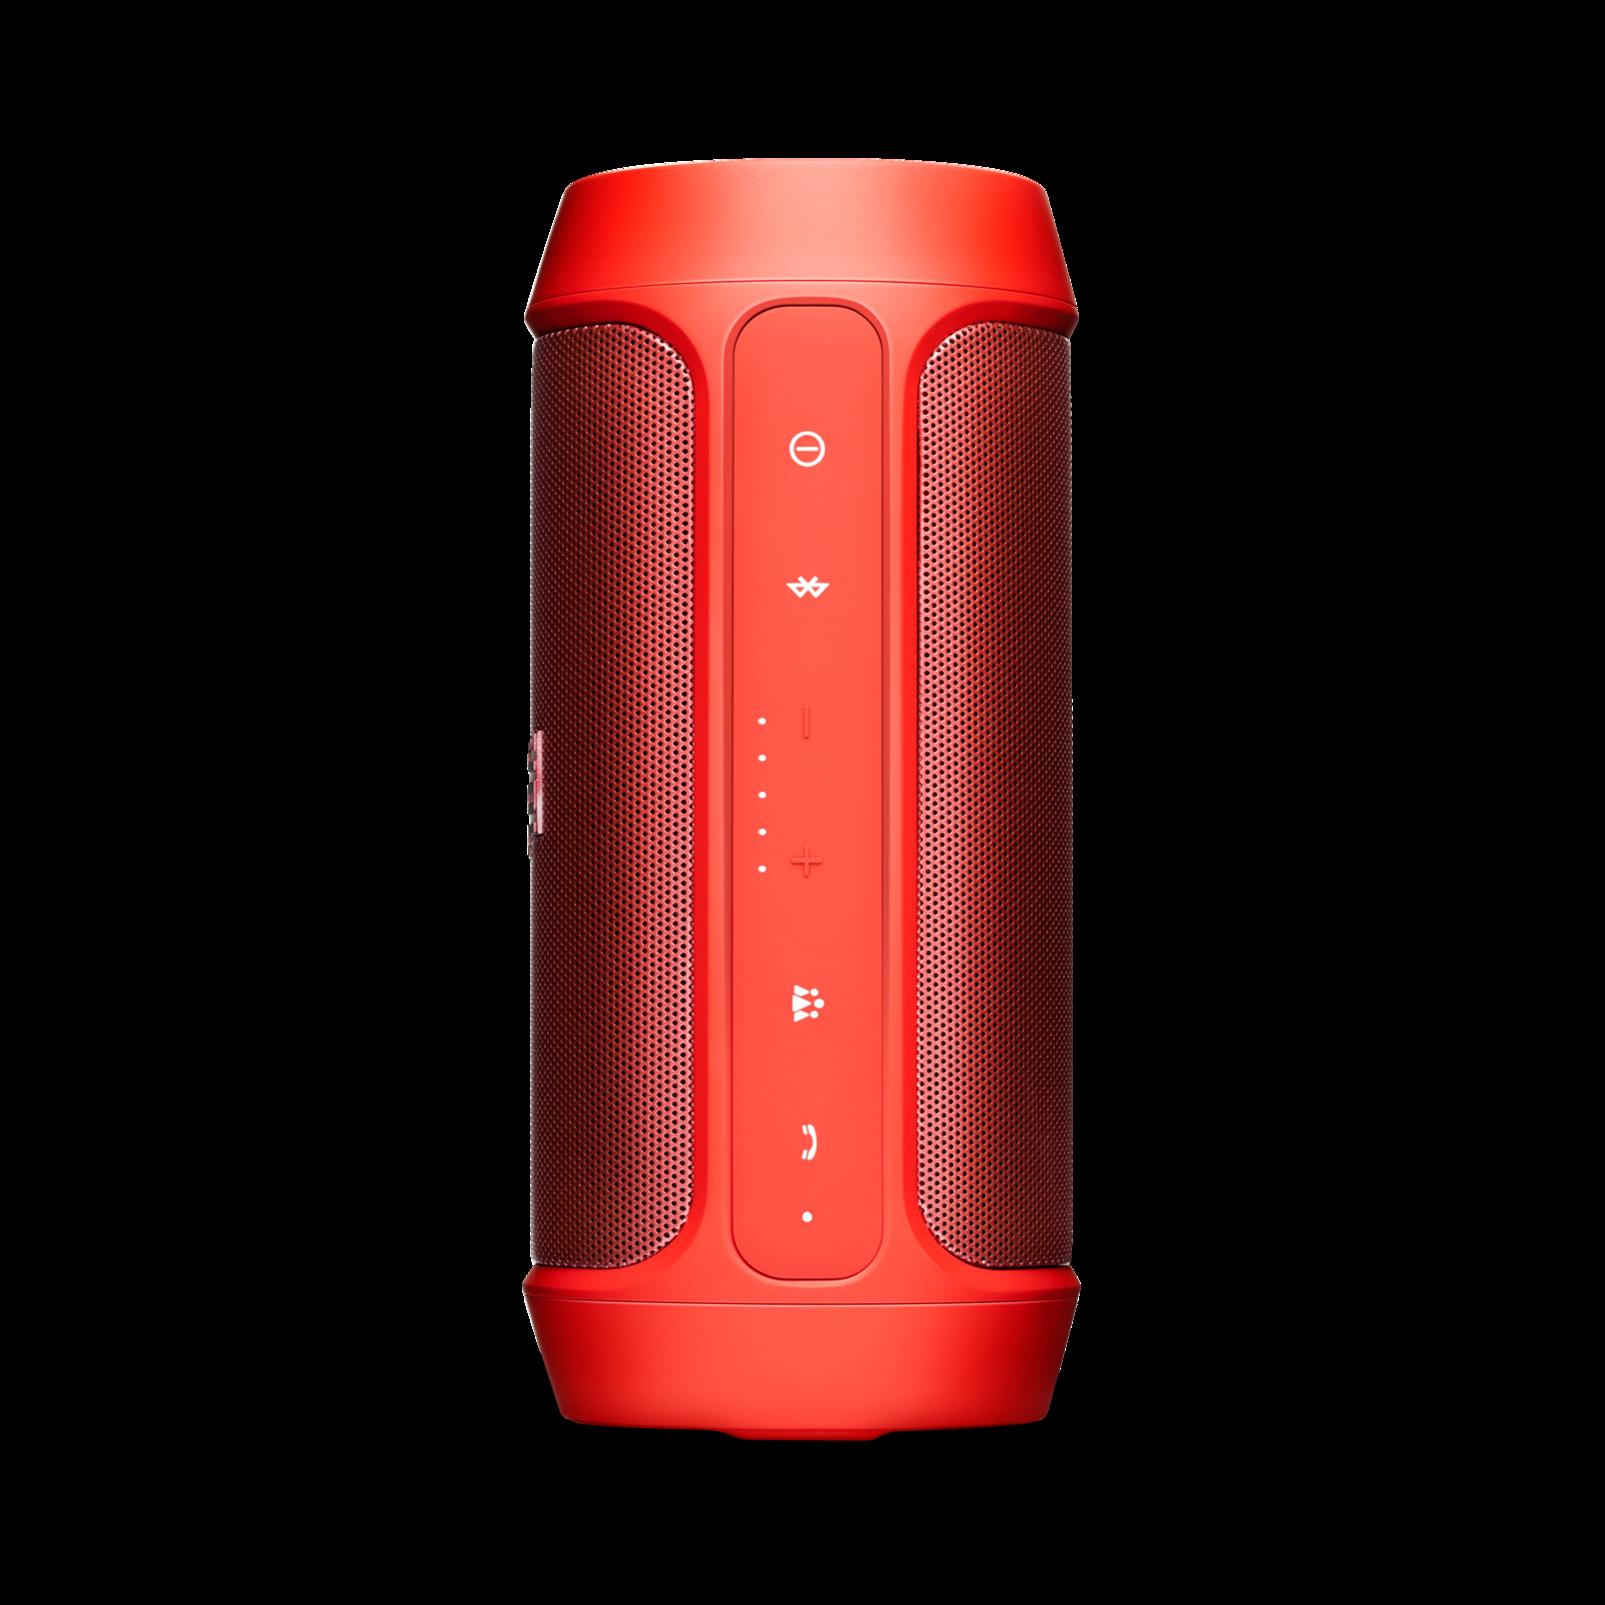 jbl charge 2 portable bluetooth speaker with usb charger. Black Bedroom Furniture Sets. Home Design Ideas